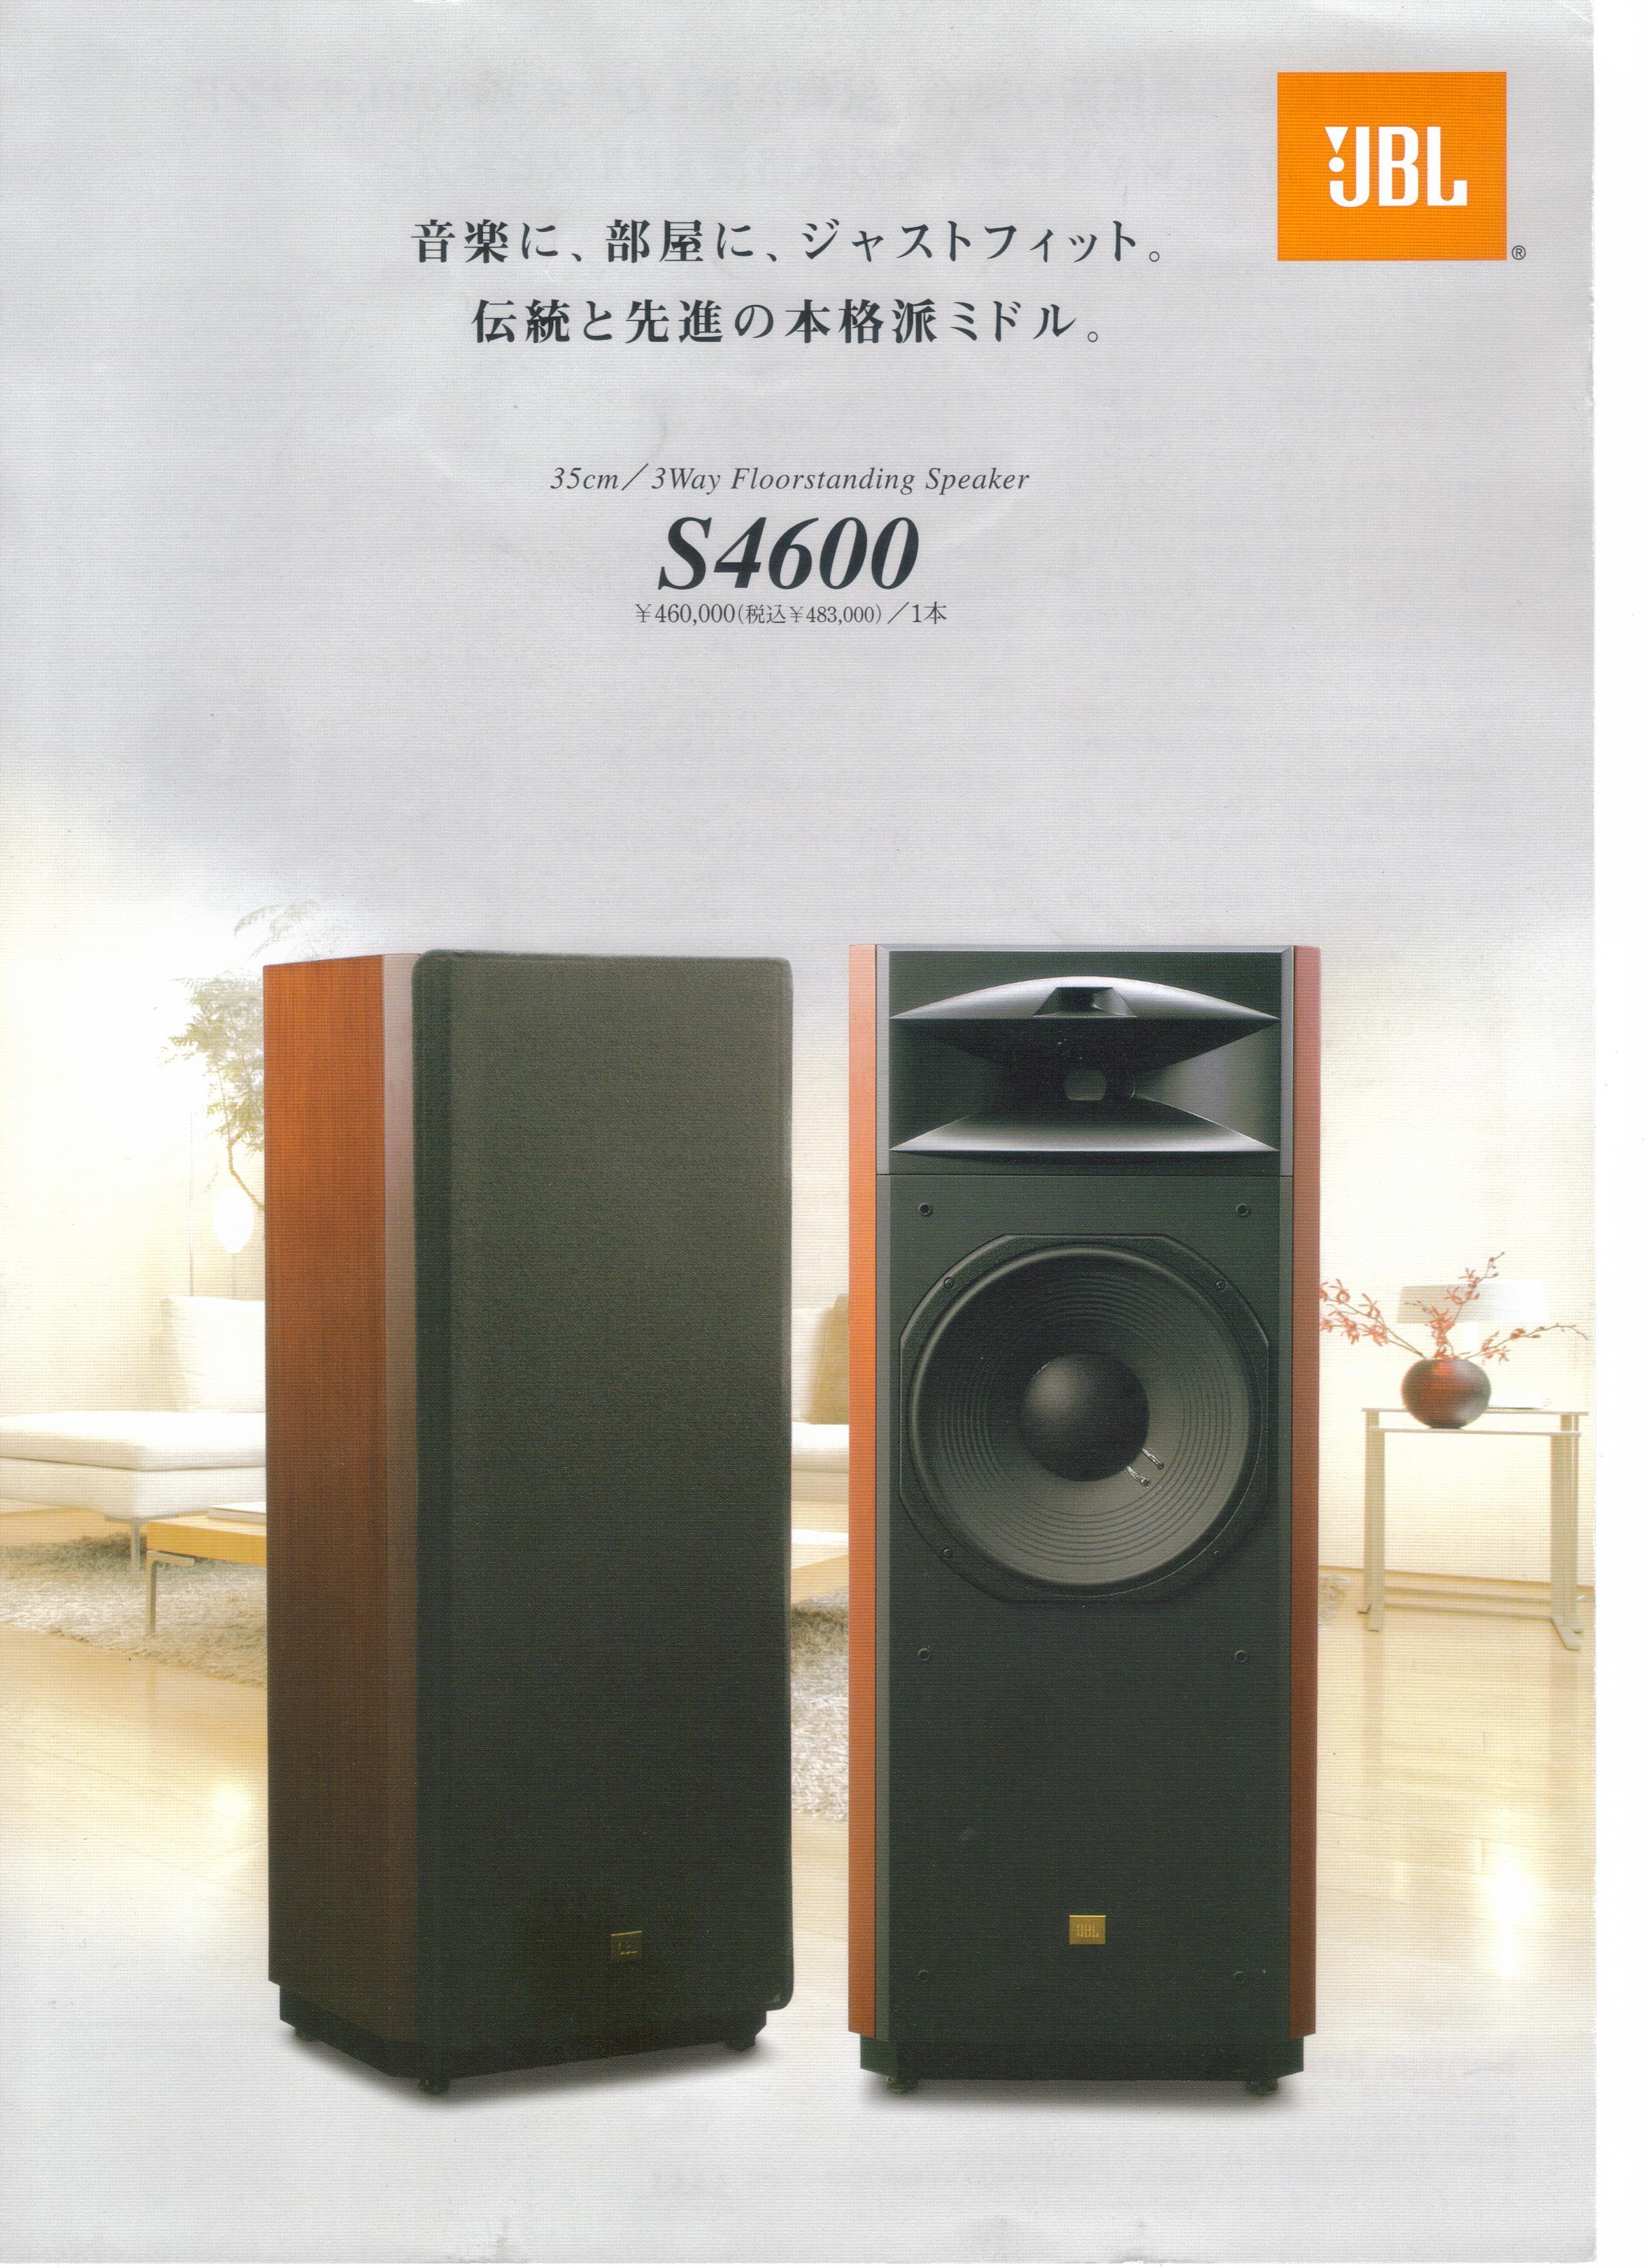 Serie K2 S4600 1011101042501207127093760